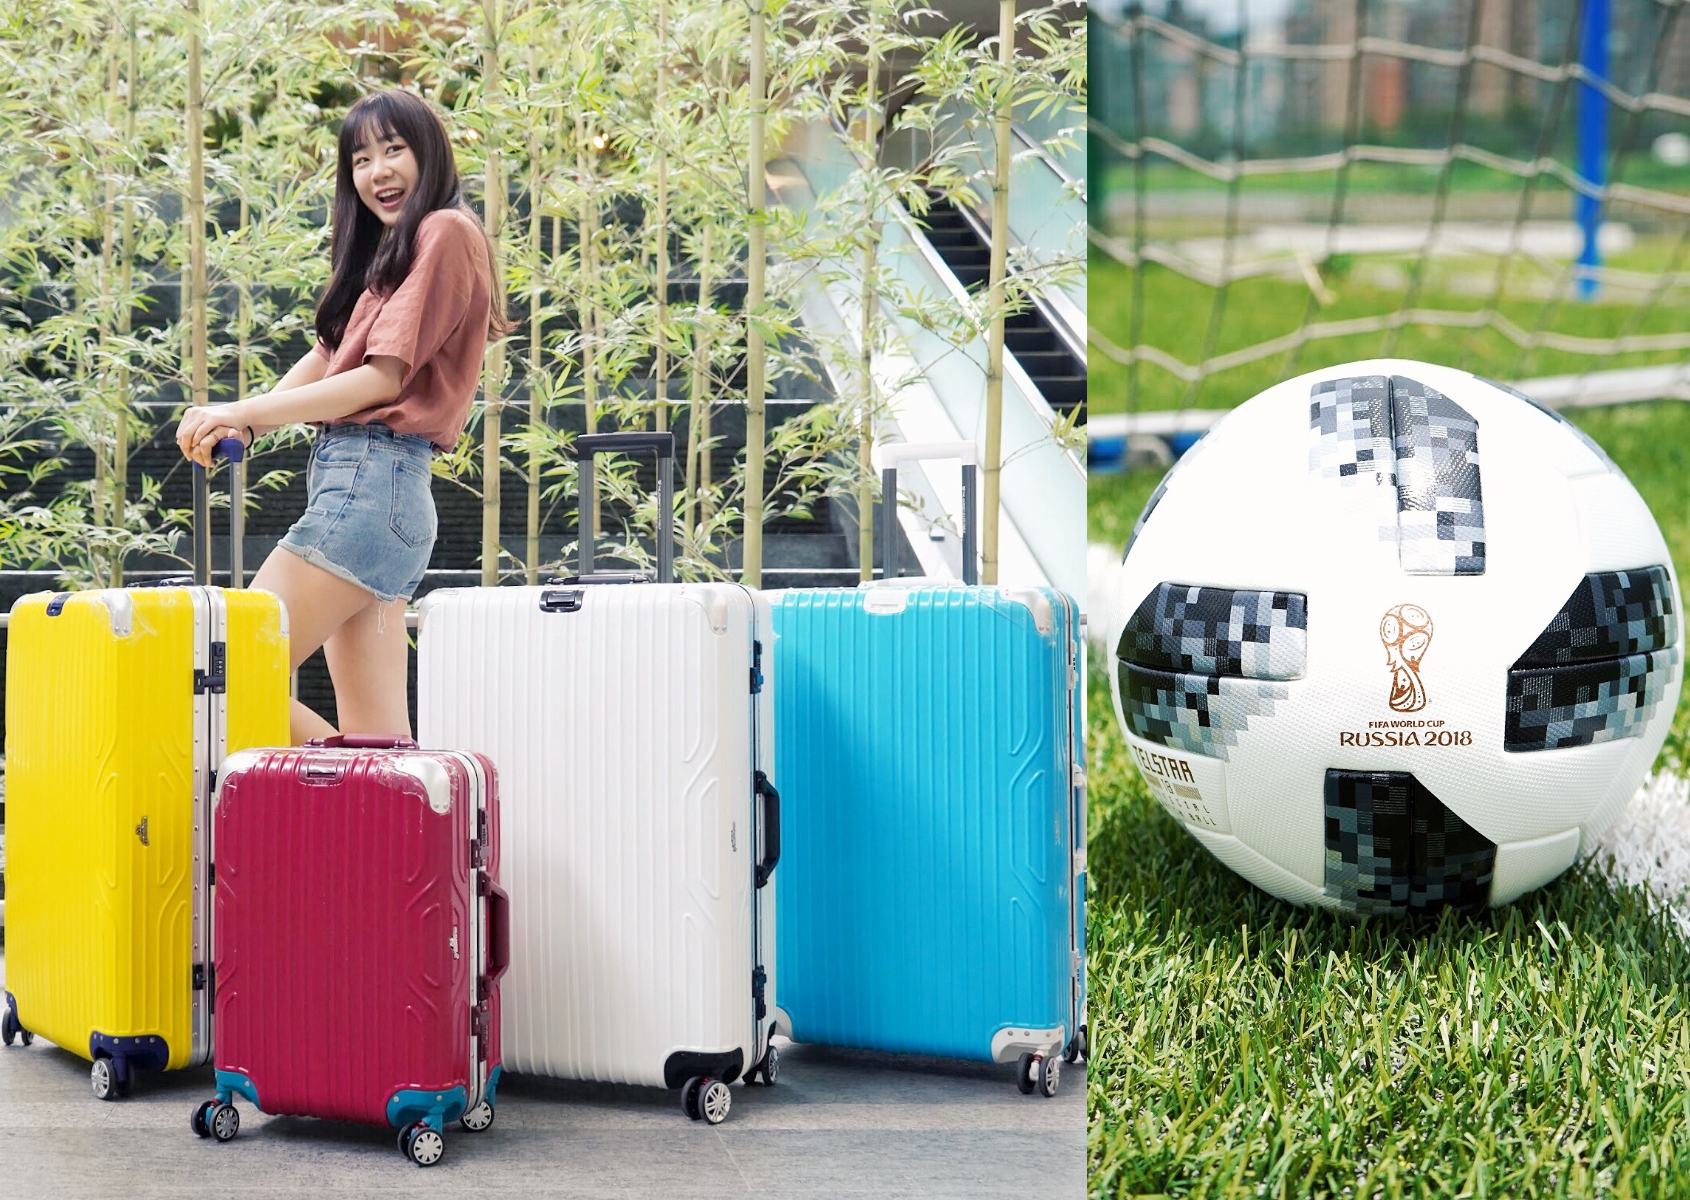 adidas 世足紀念球、球衣、Arowana 行李箱,最強最夯世界盃足球商品特蒐!